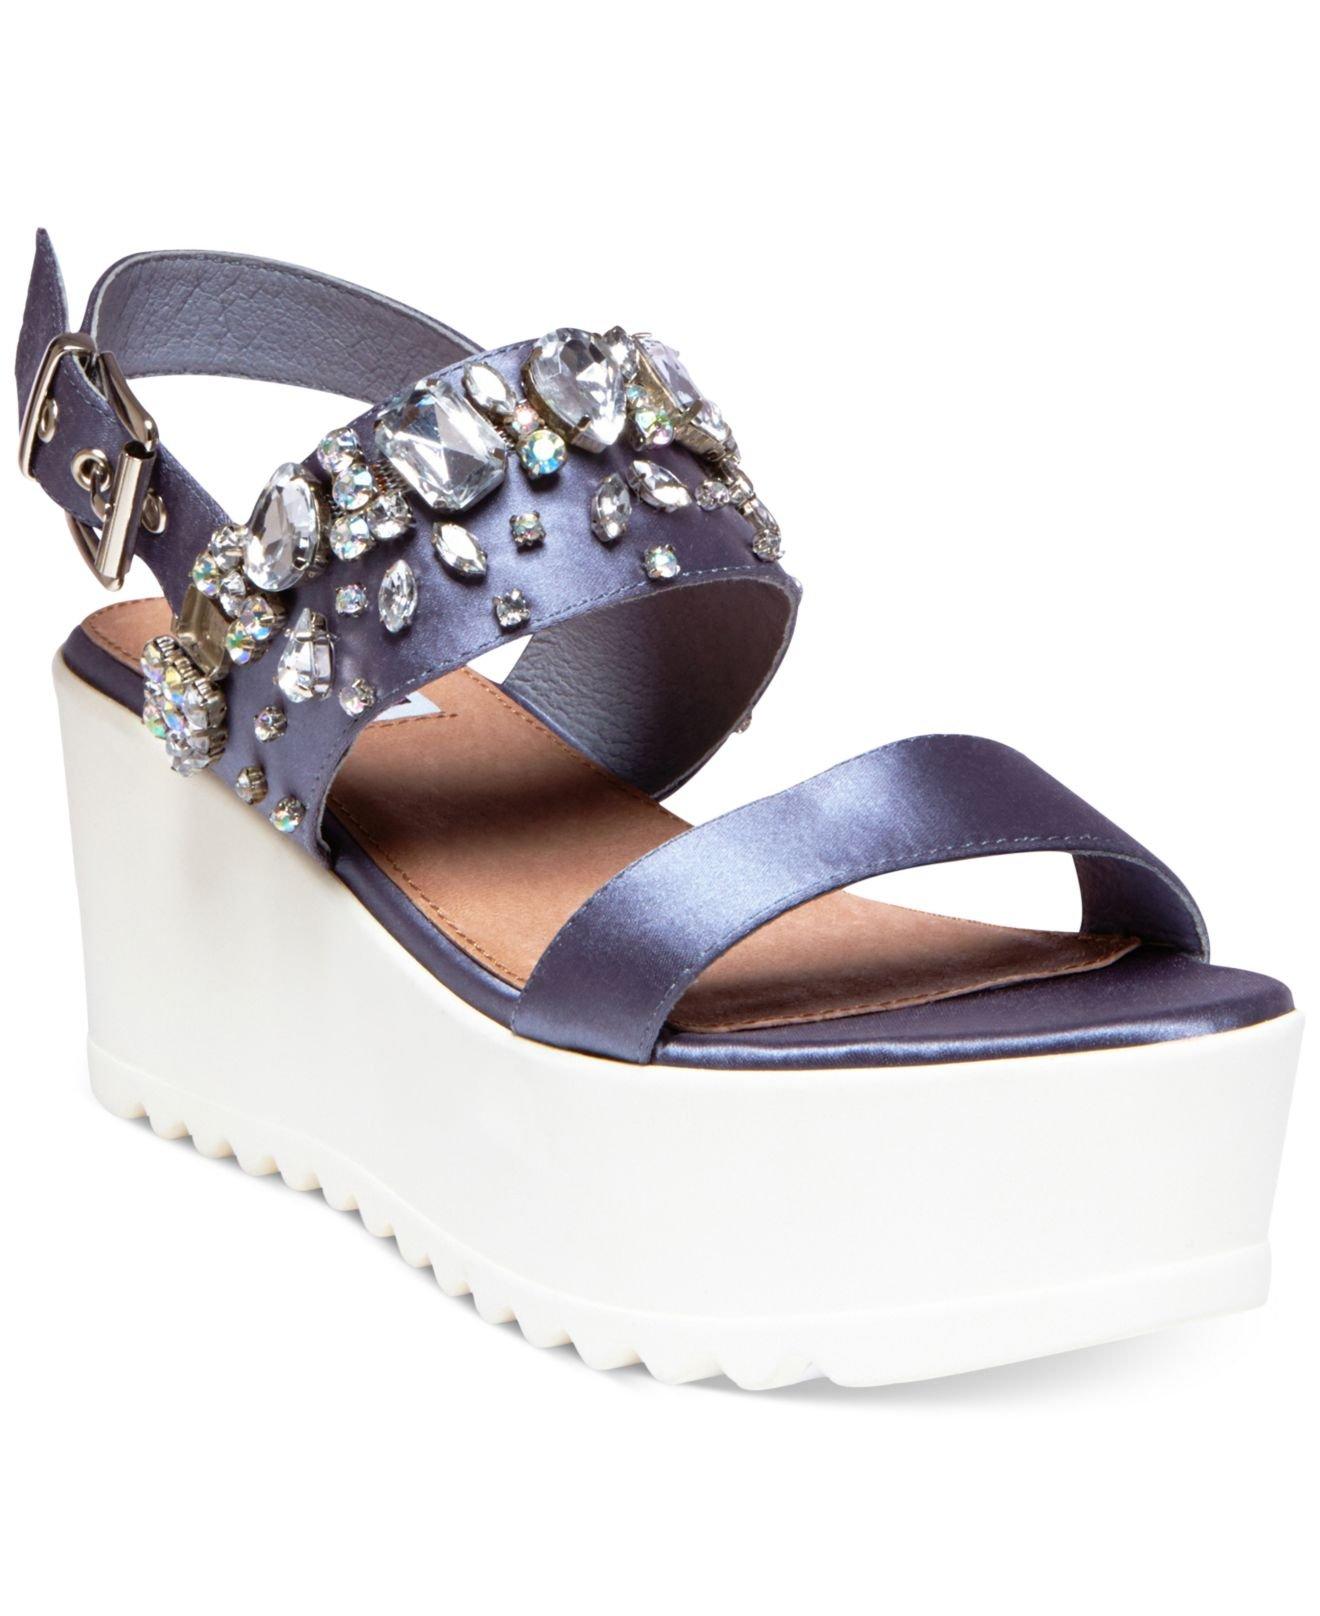 fe221a69871 Lyst - Steve Madden By Iggy Azalea Ono Bling Flatform Wedge Sandals ...